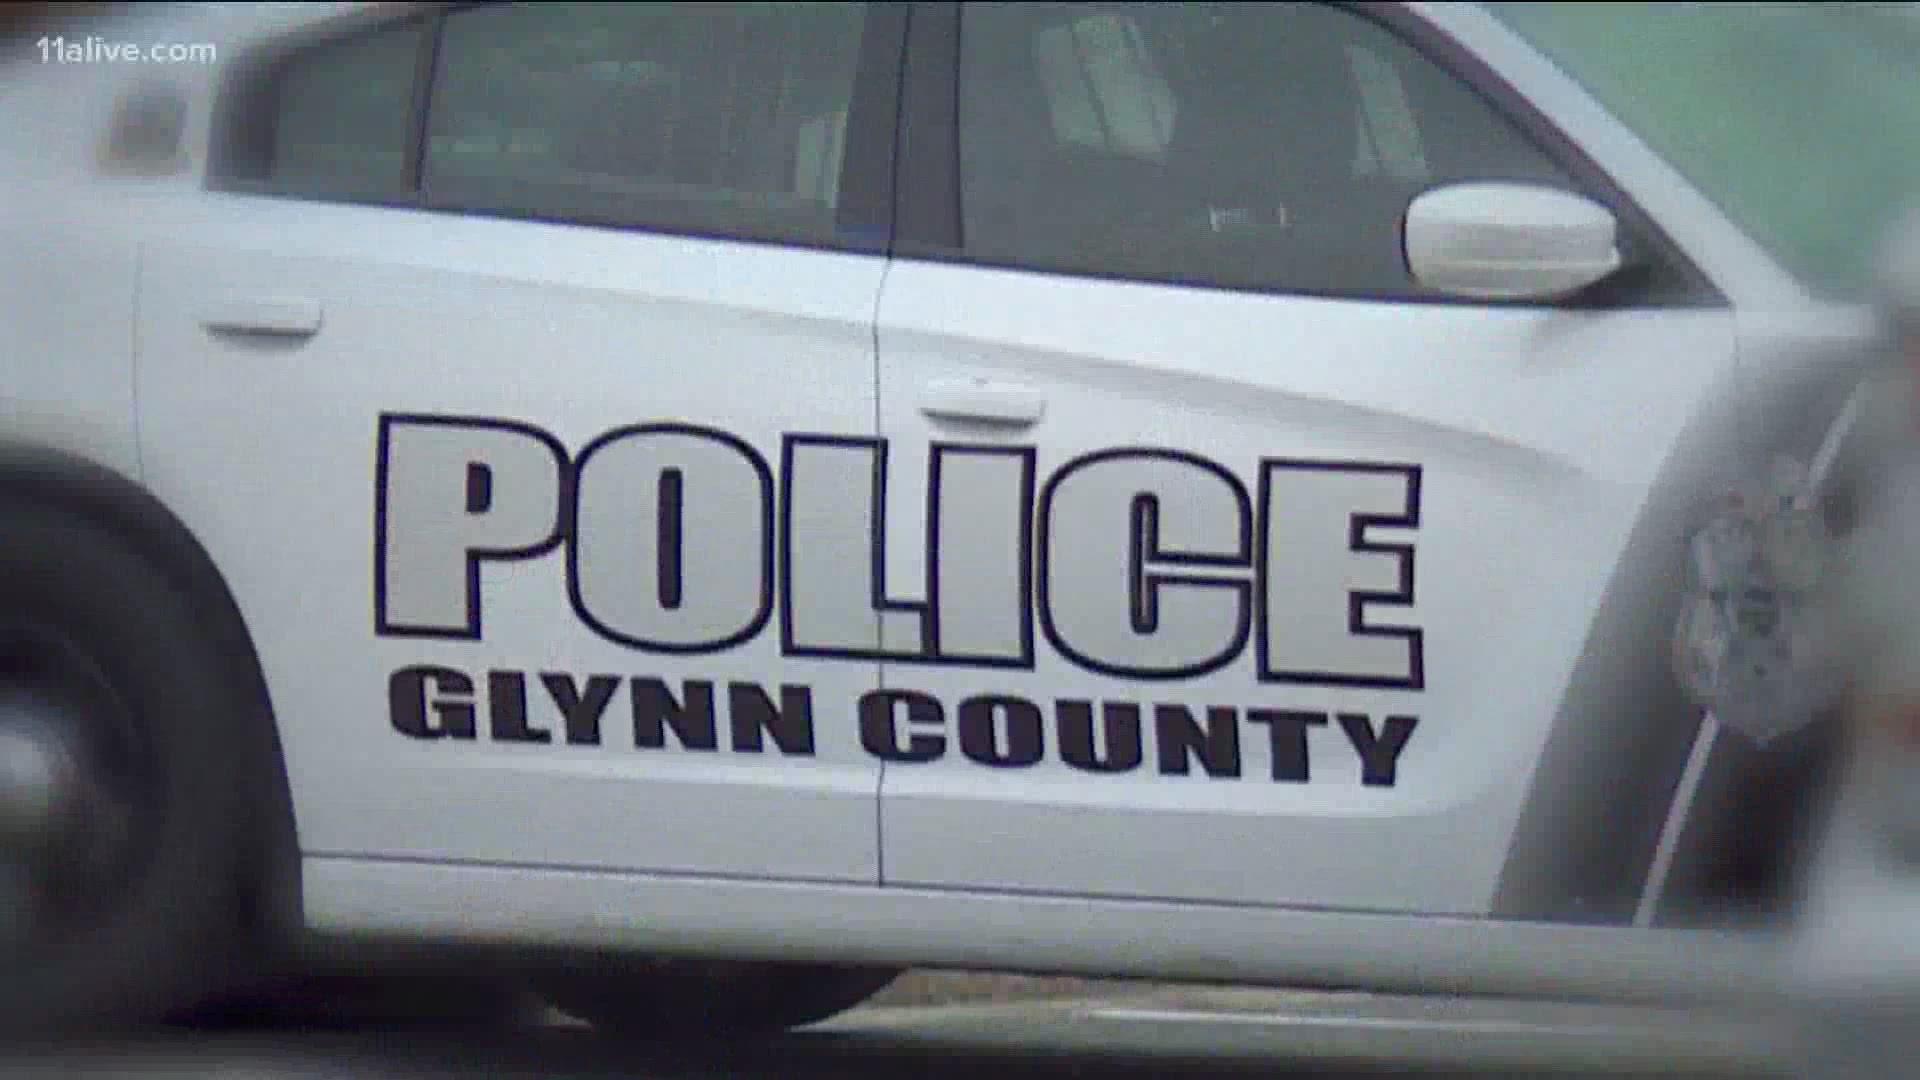 Glynn County Police under fire in wake of Ahmaud Arbery case ...